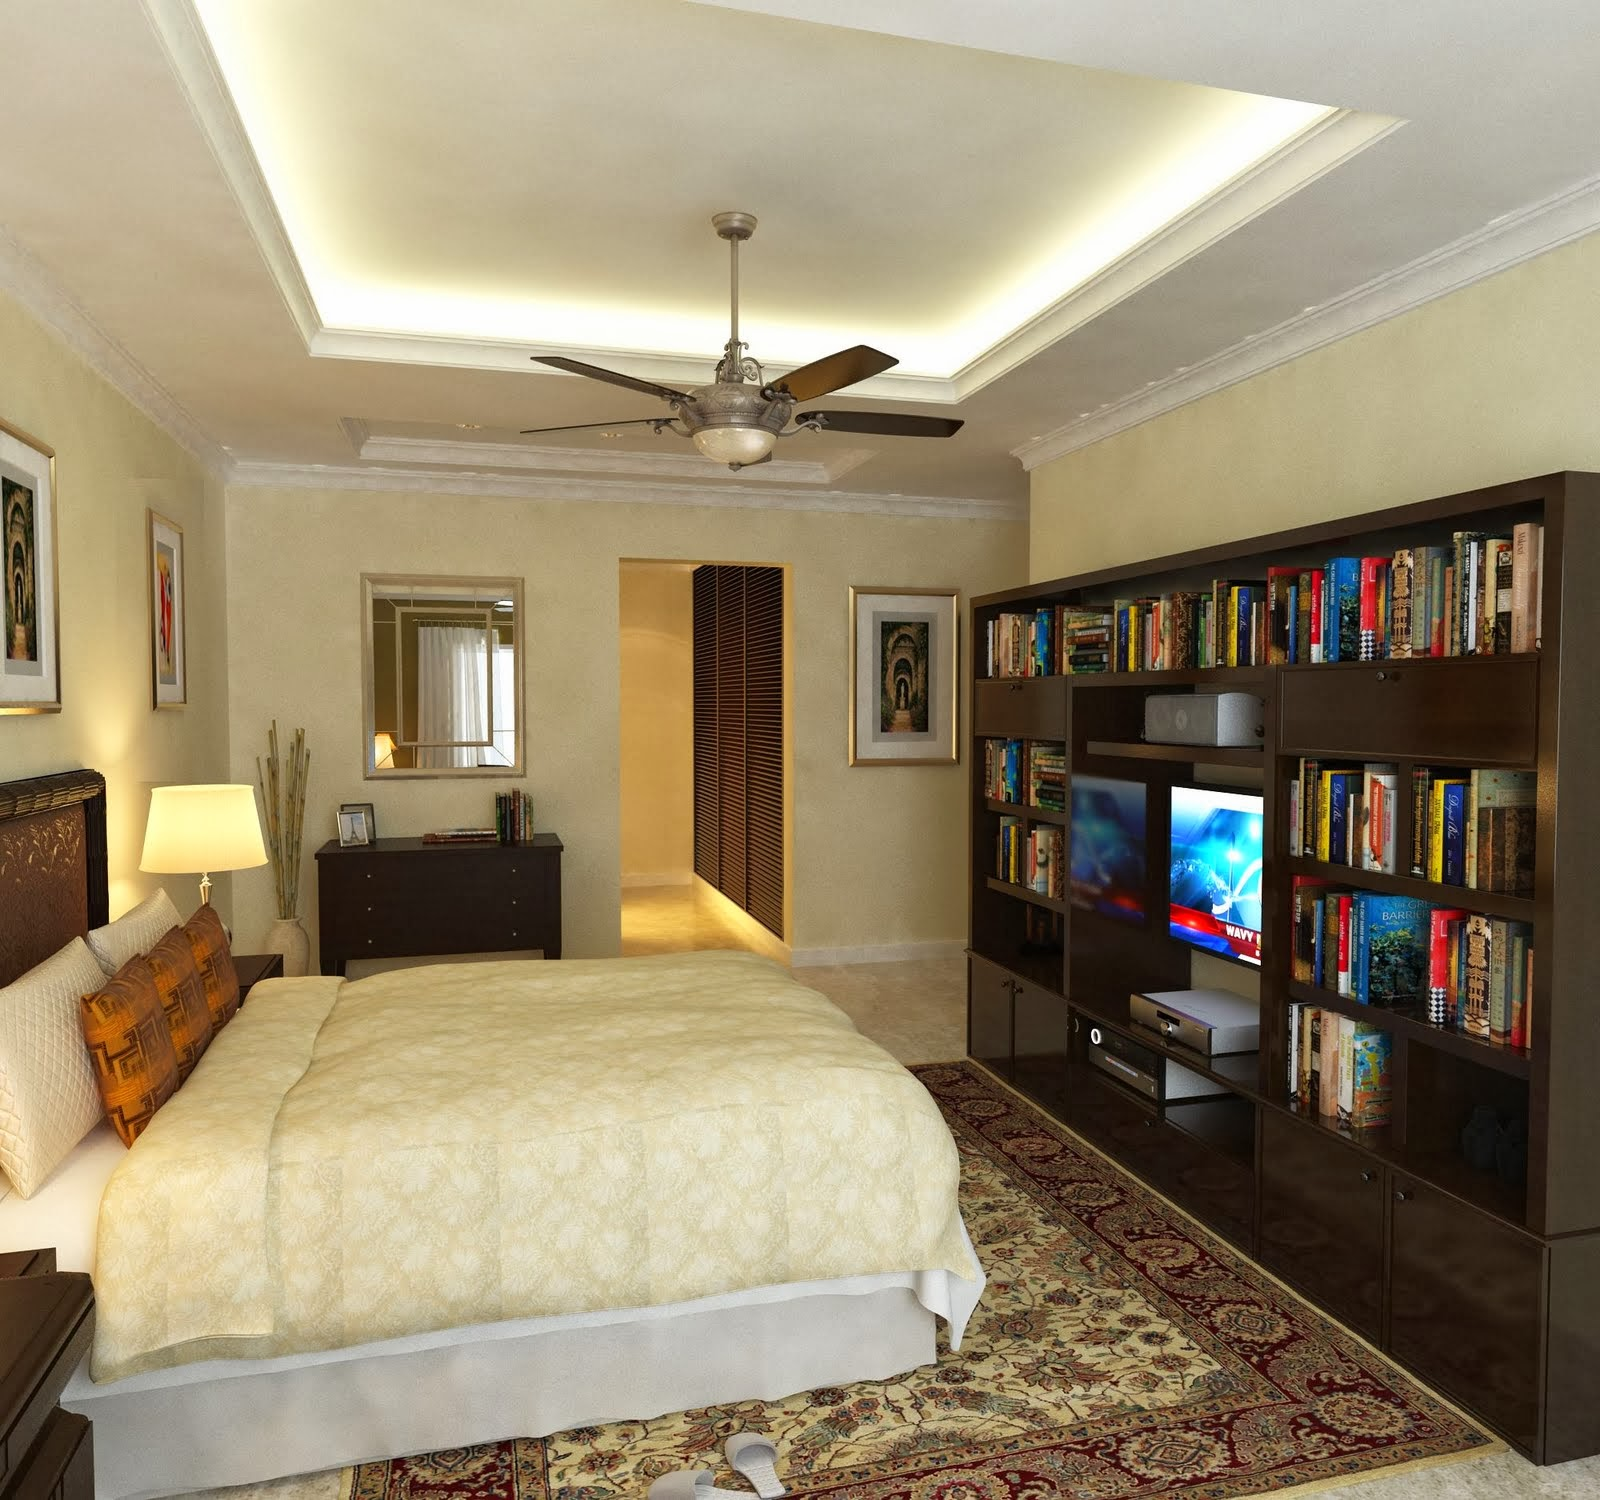 Virtual Bedroom: My Virtual Diary